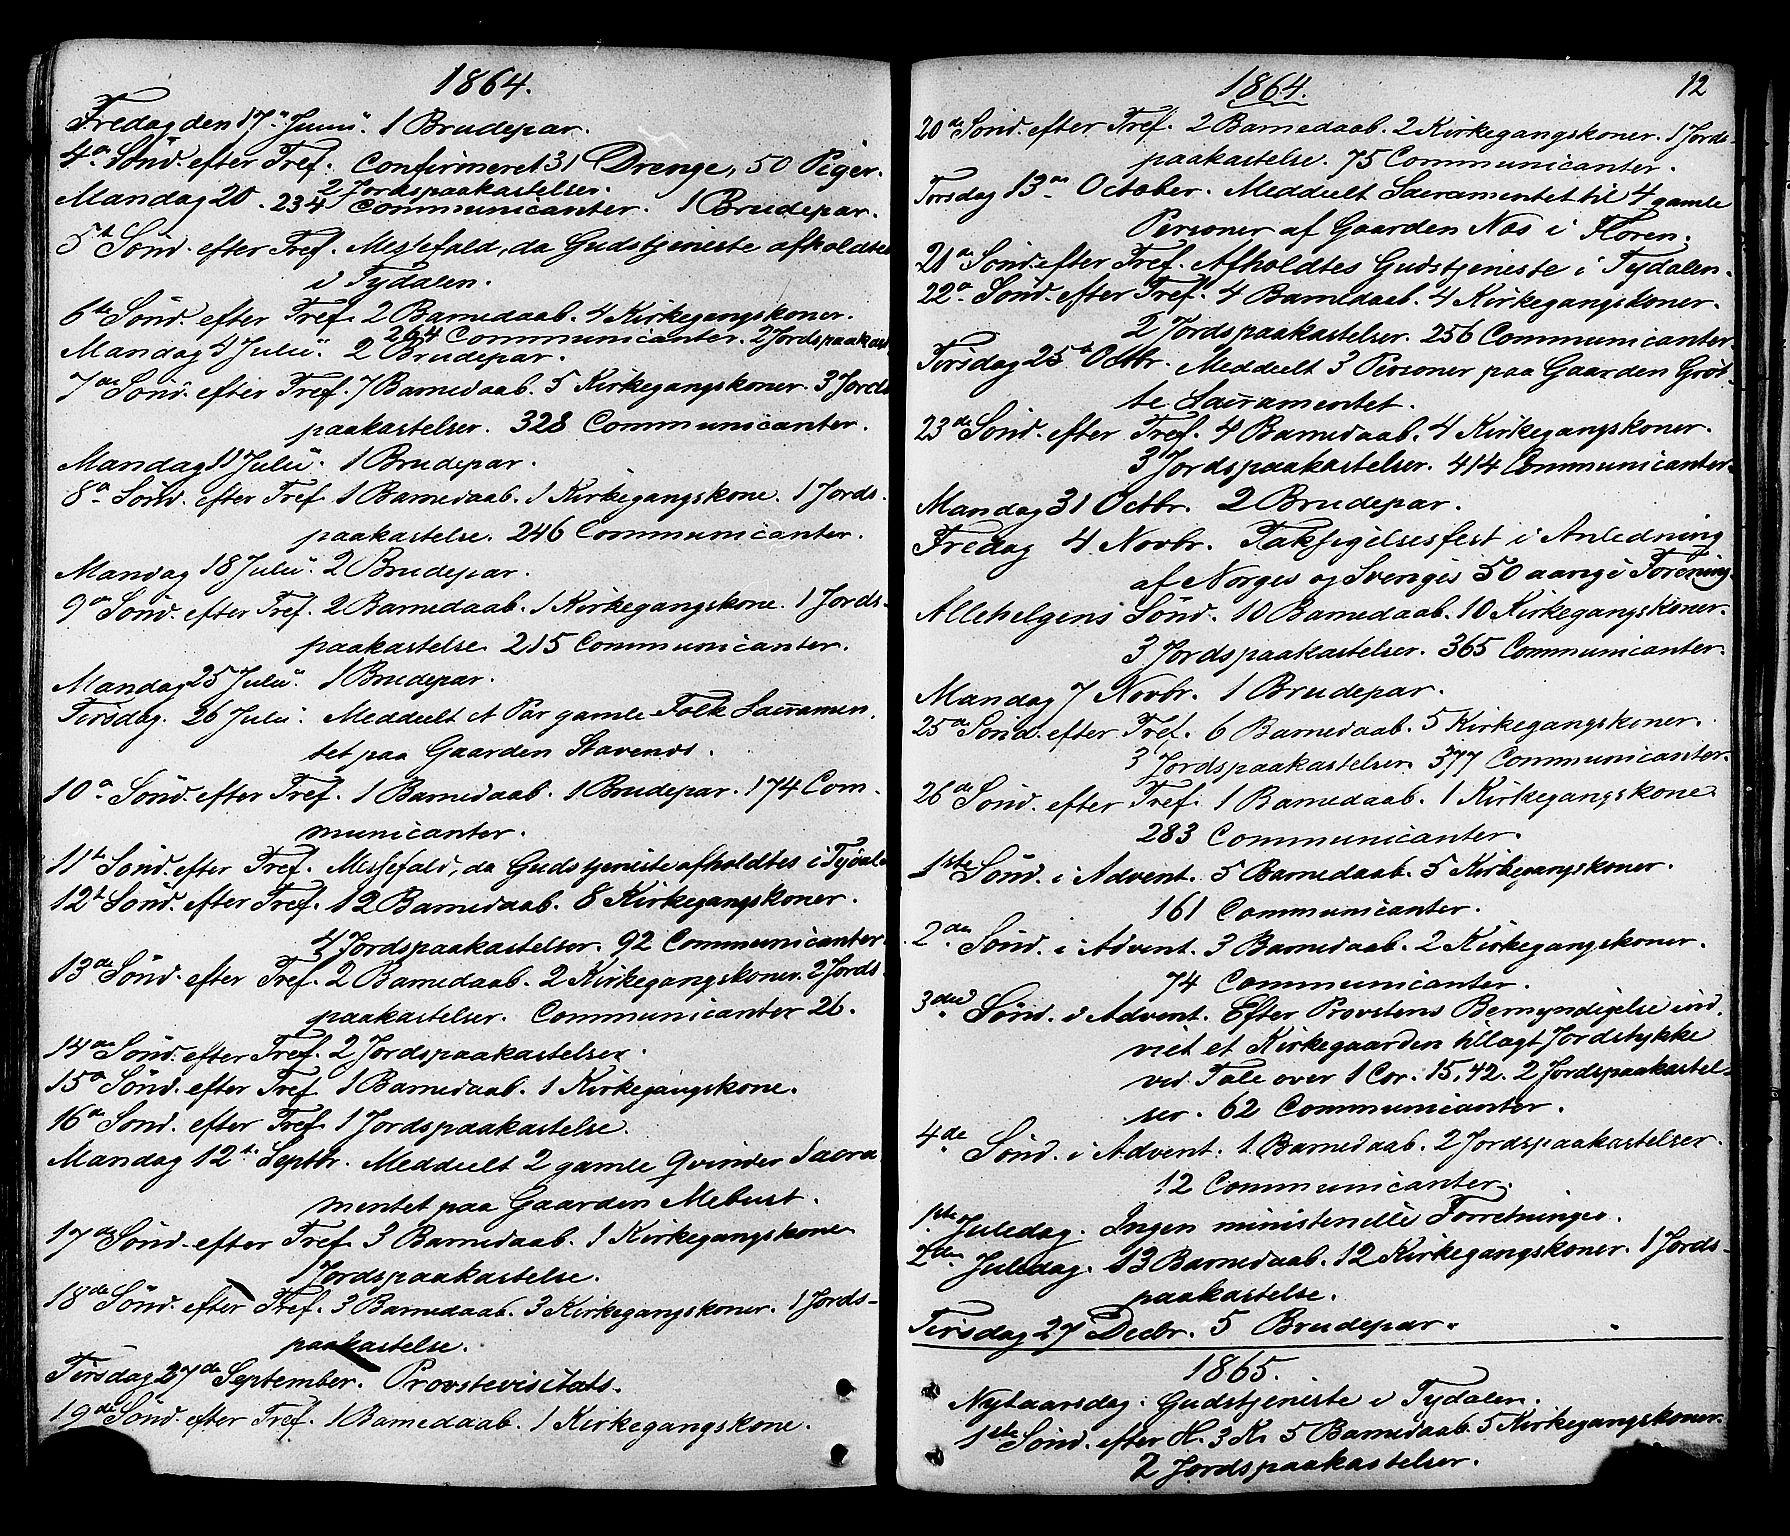 SAT, Ministerialprotokoller, klokkerbøker og fødselsregistre - Sør-Trøndelag, 695/L1147: Parish register (official) no. 695A07, 1860-1877, p. 12